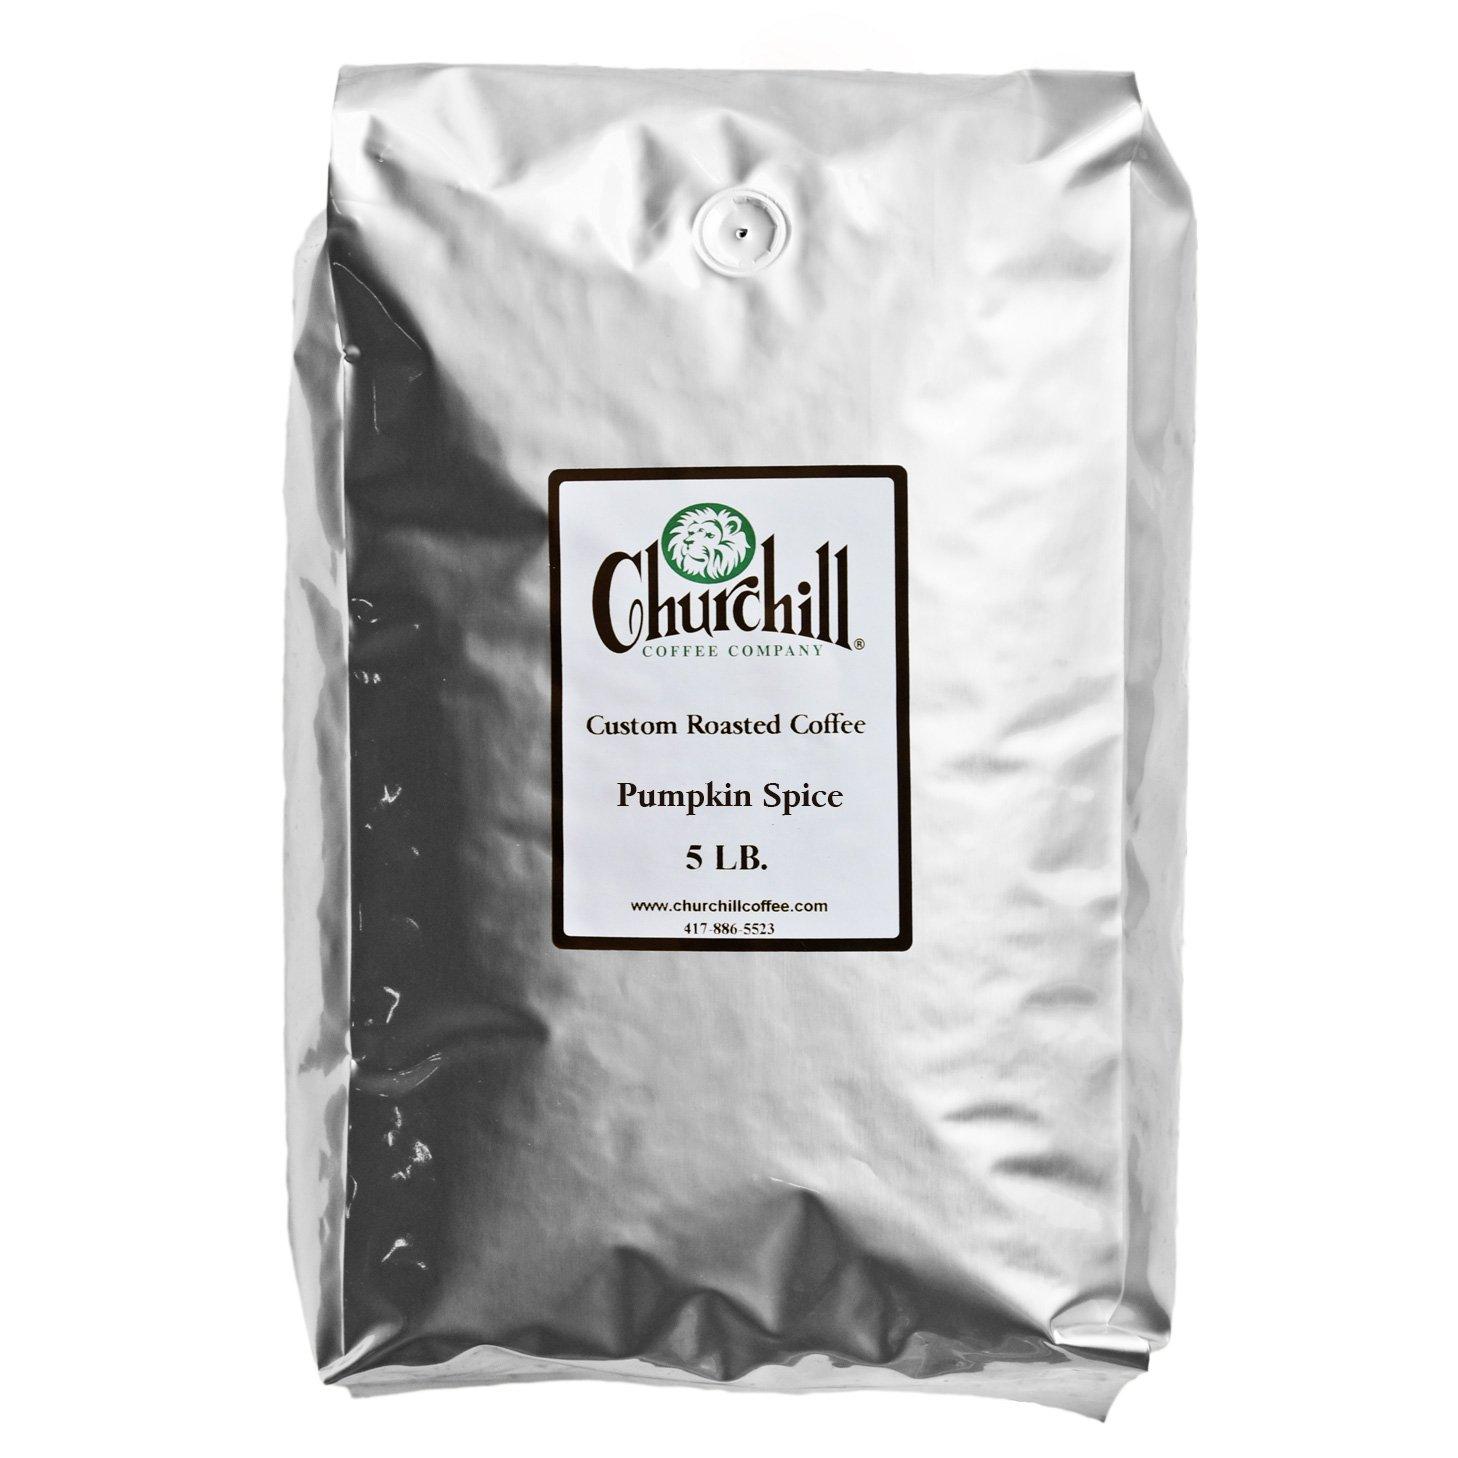 Churchill Coffee Pumpkin Spice lb Ground 5 Denver Max 72% OFF Mall -